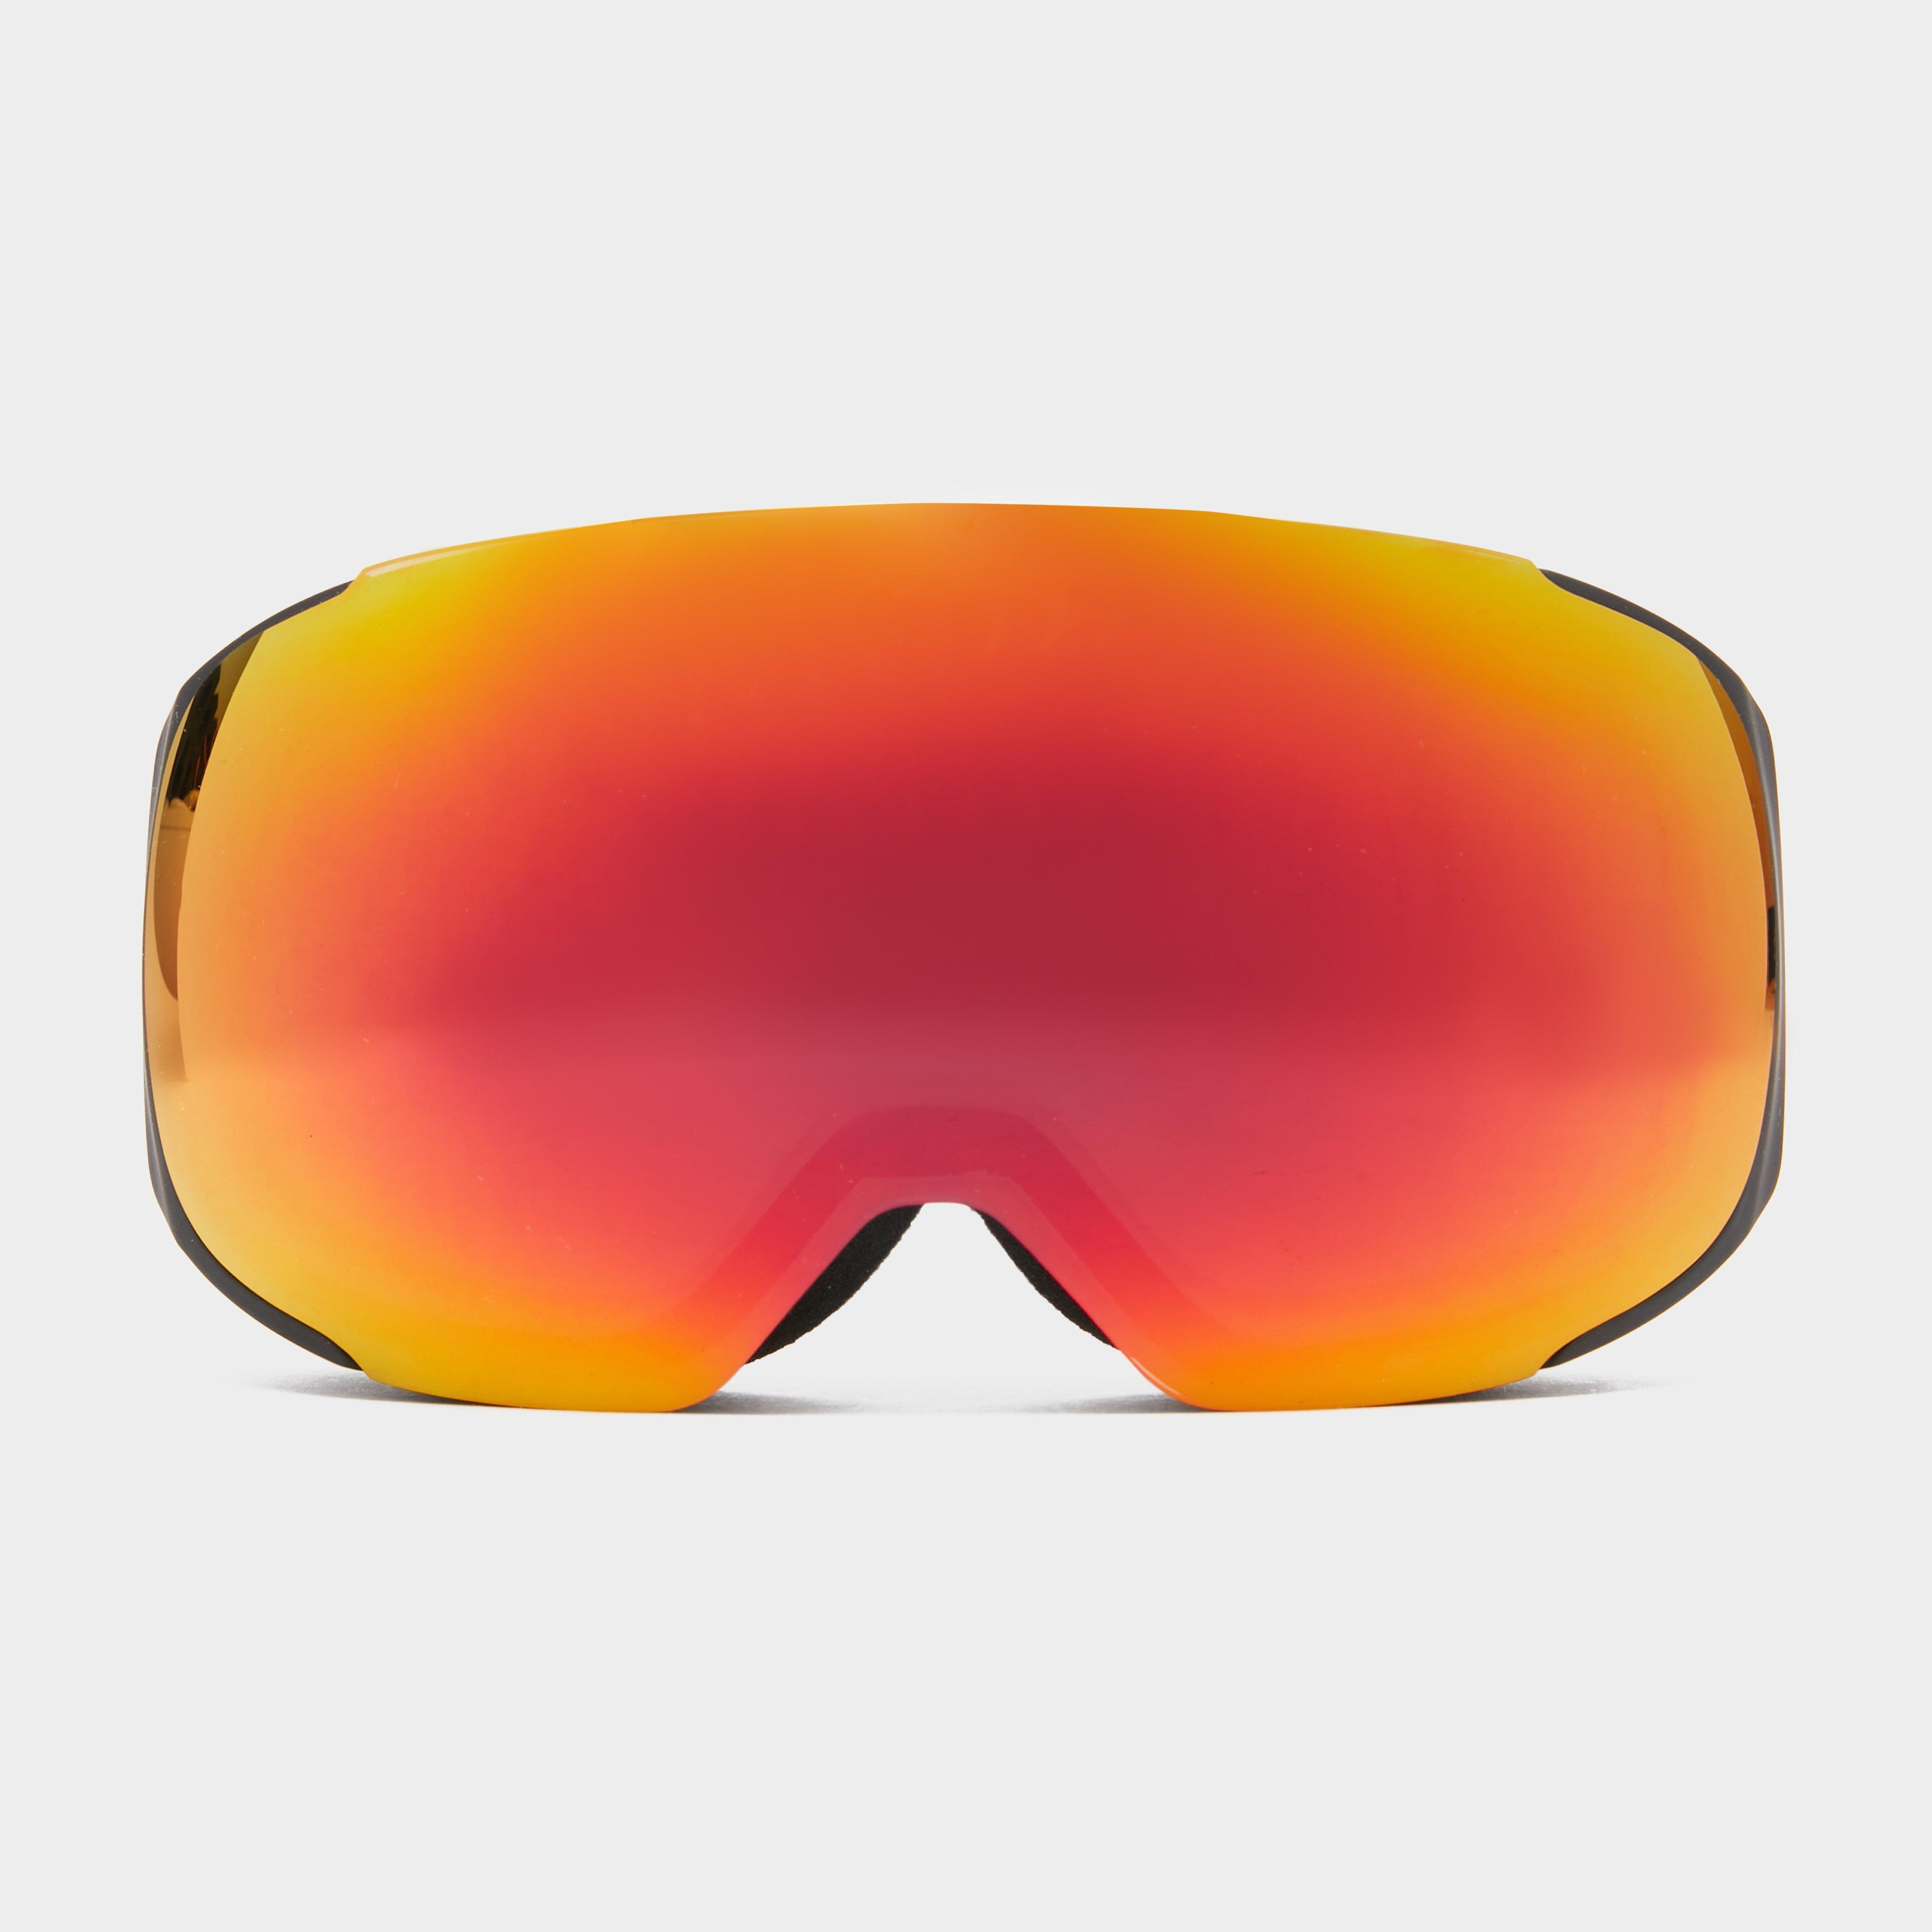 The Edge Aquilo Interchangeable Goggles - Black/grey  Black/grey